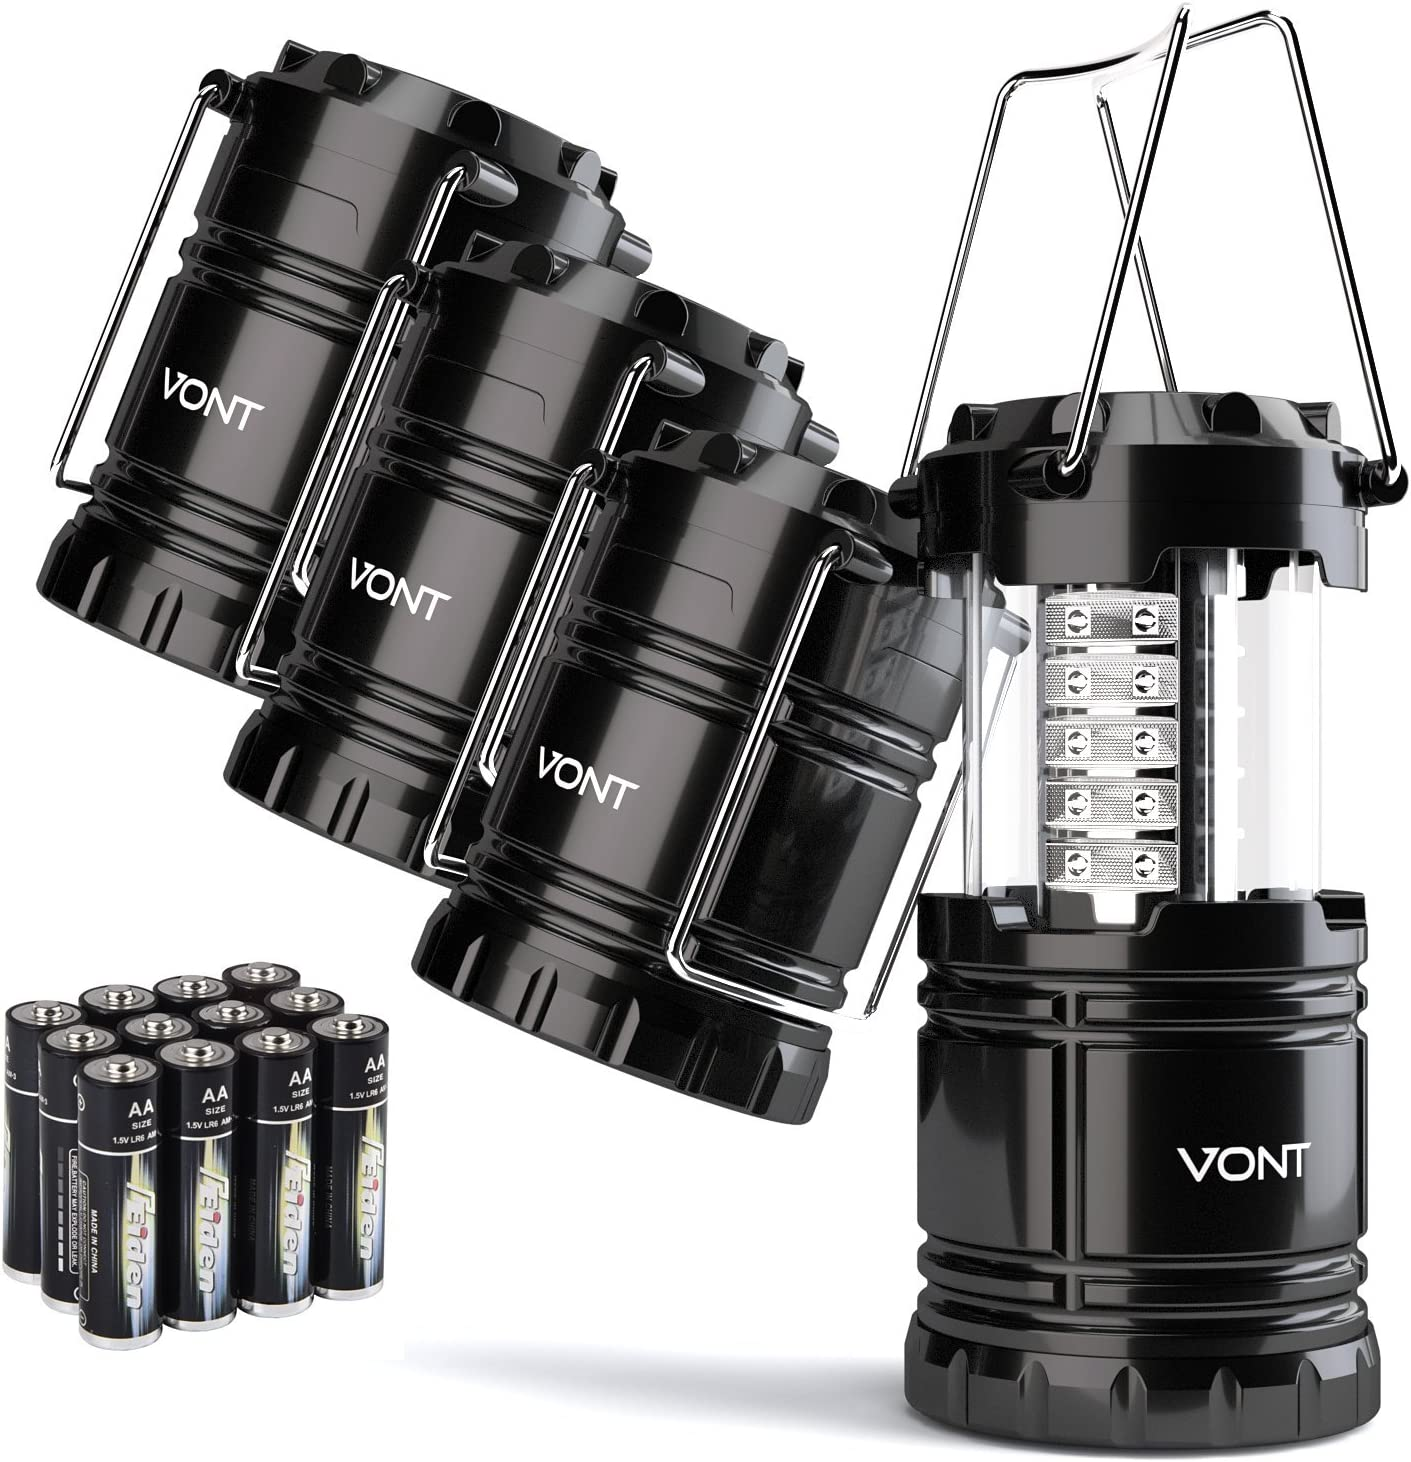 Vont LED Camping Lantern – 4 Pack